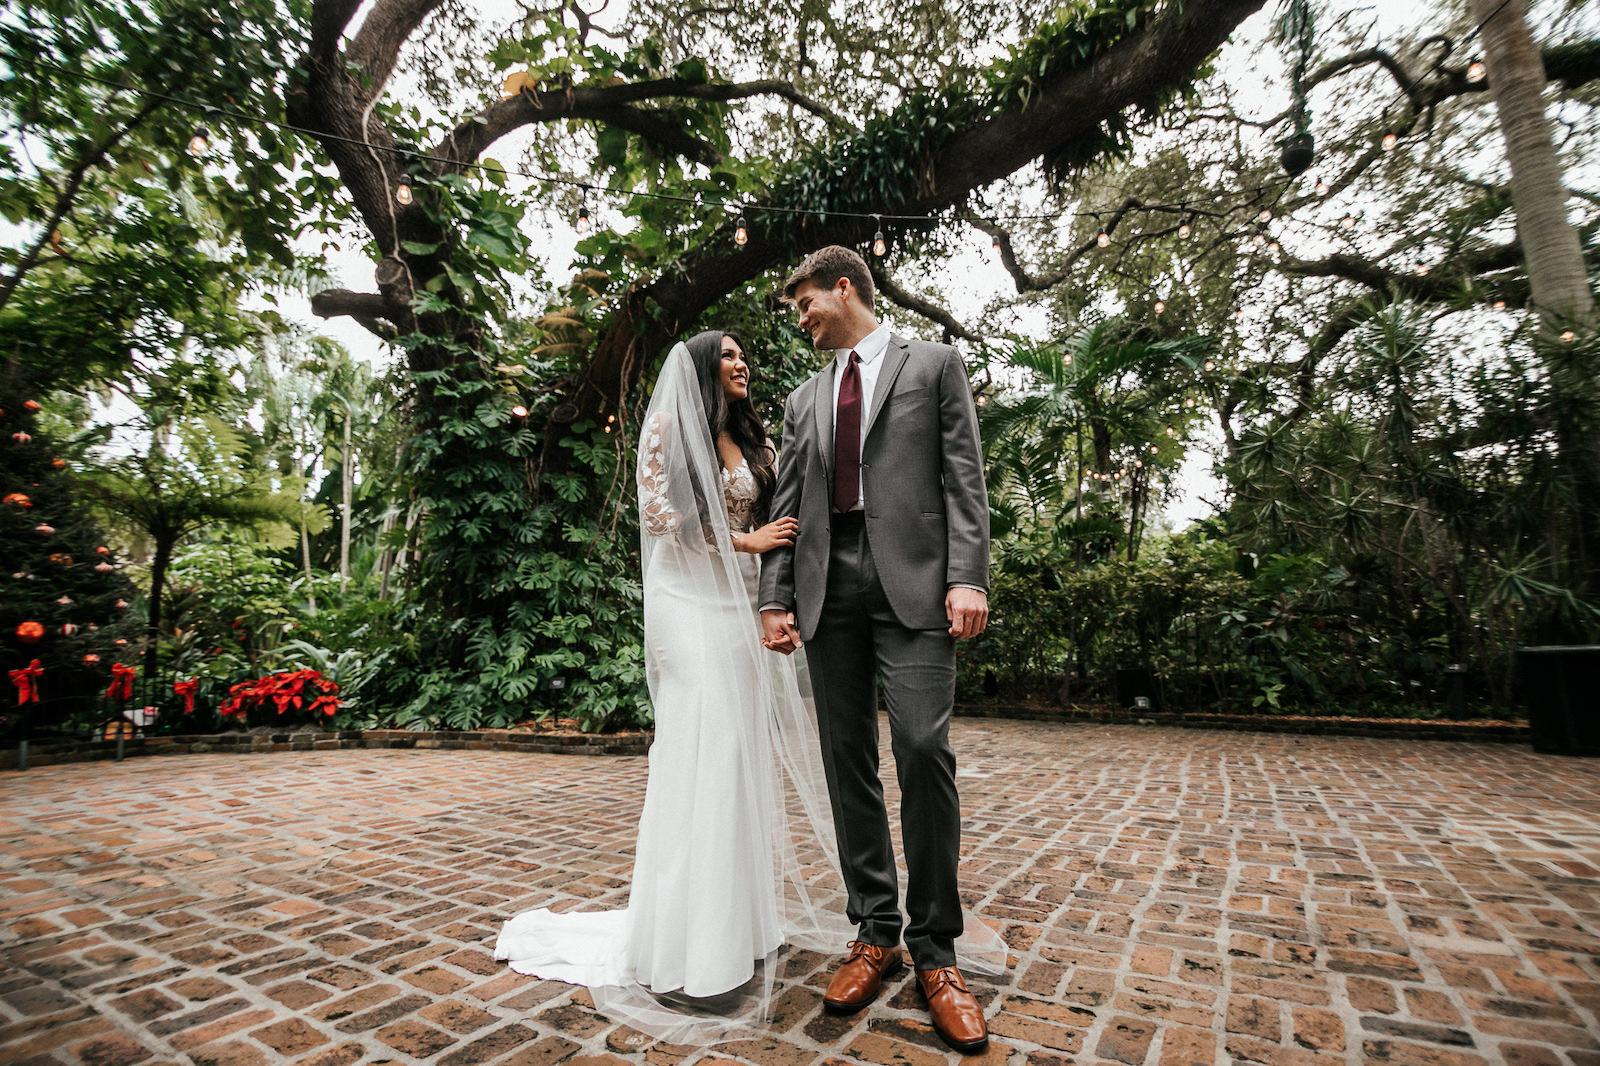 Tampa Bay Bride and Groom At Sunken Gardens Wedding Venue in St. Petersburg, Bride Wearing BHLDN Wedding Dress, Groom Wearing Wine Burgundy Color Tie and Charcoal Gray Suit | Florida Wedding Planner John Campbell Weddings